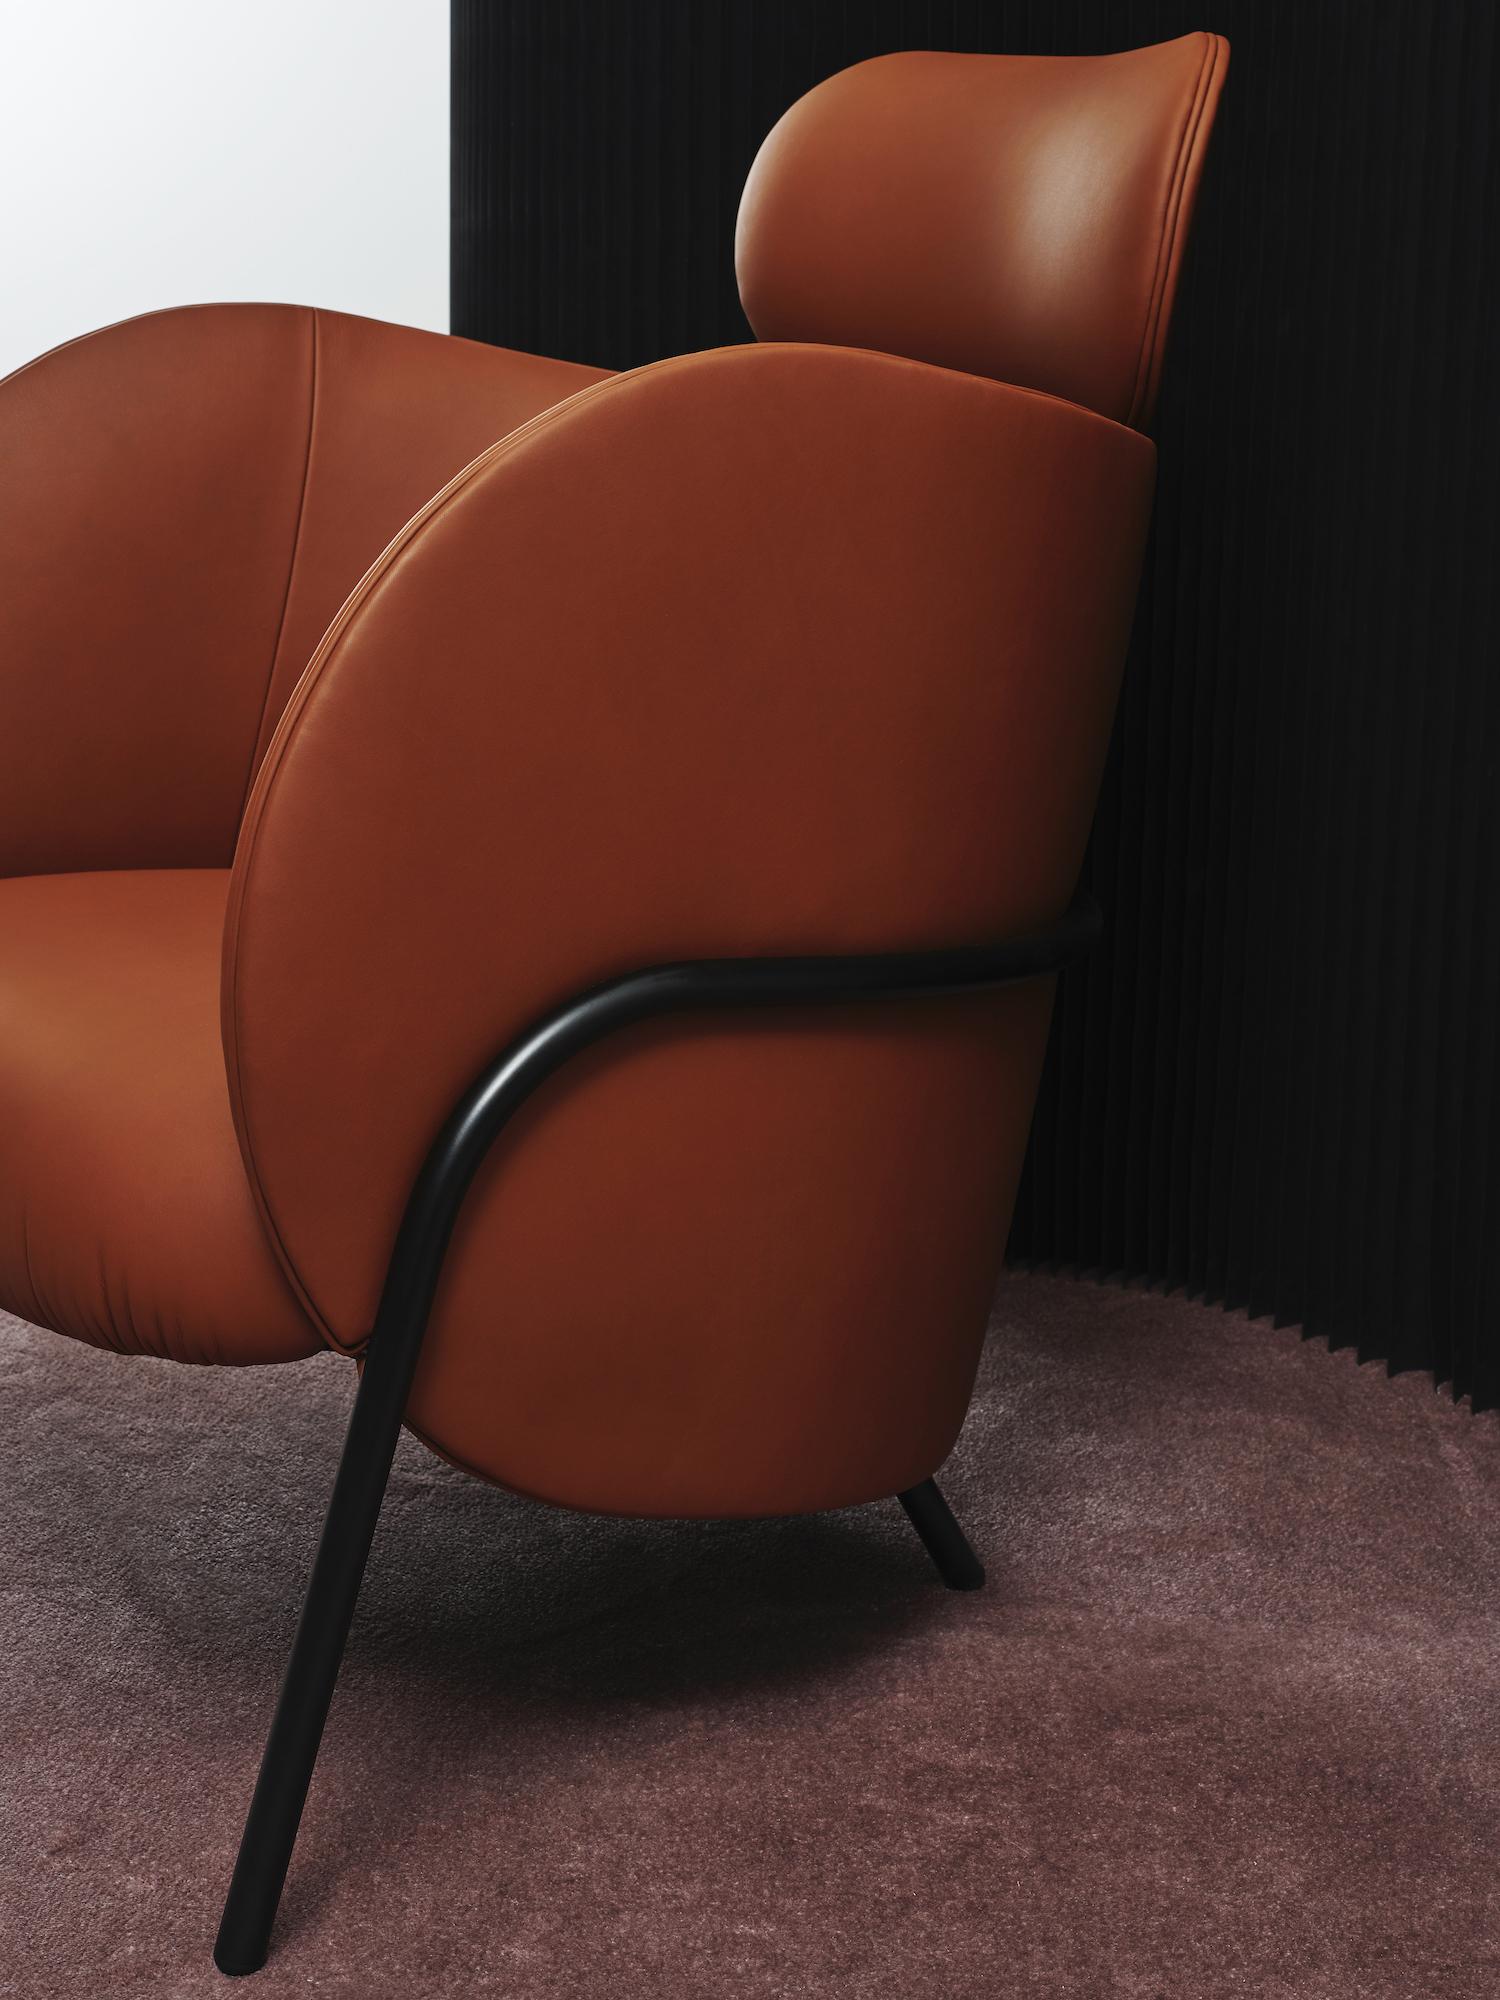 est living royce armchair nikolai kotlarczyk spo1 5